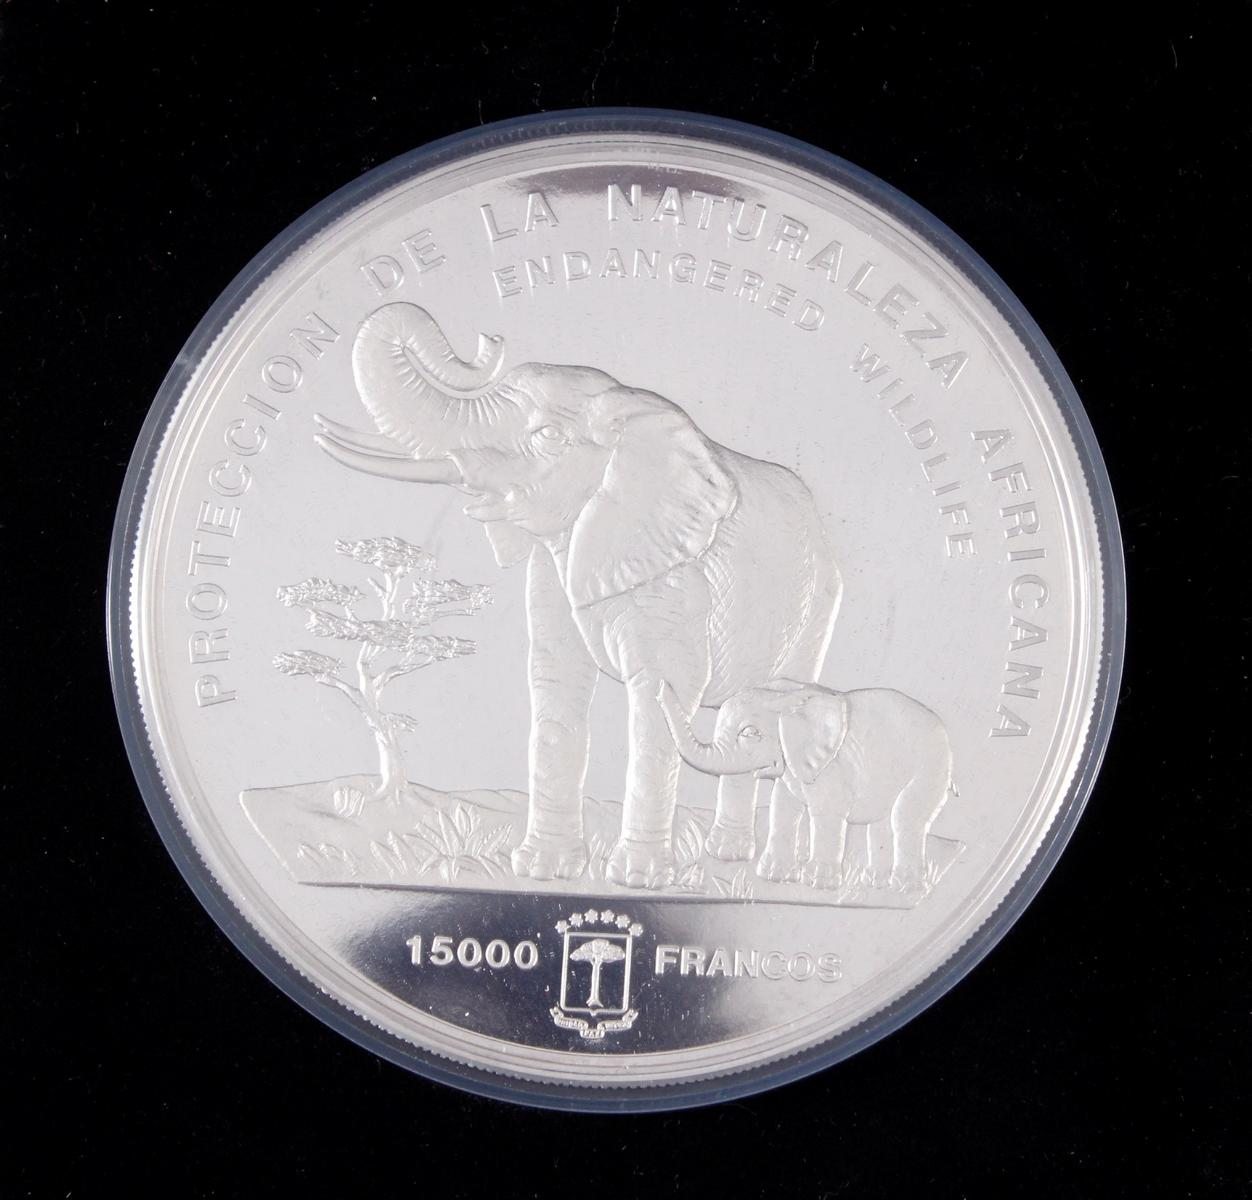 Silbermünze 15.000 Francos 1992 Guinea, 999,9 Silber, 1 kg-2